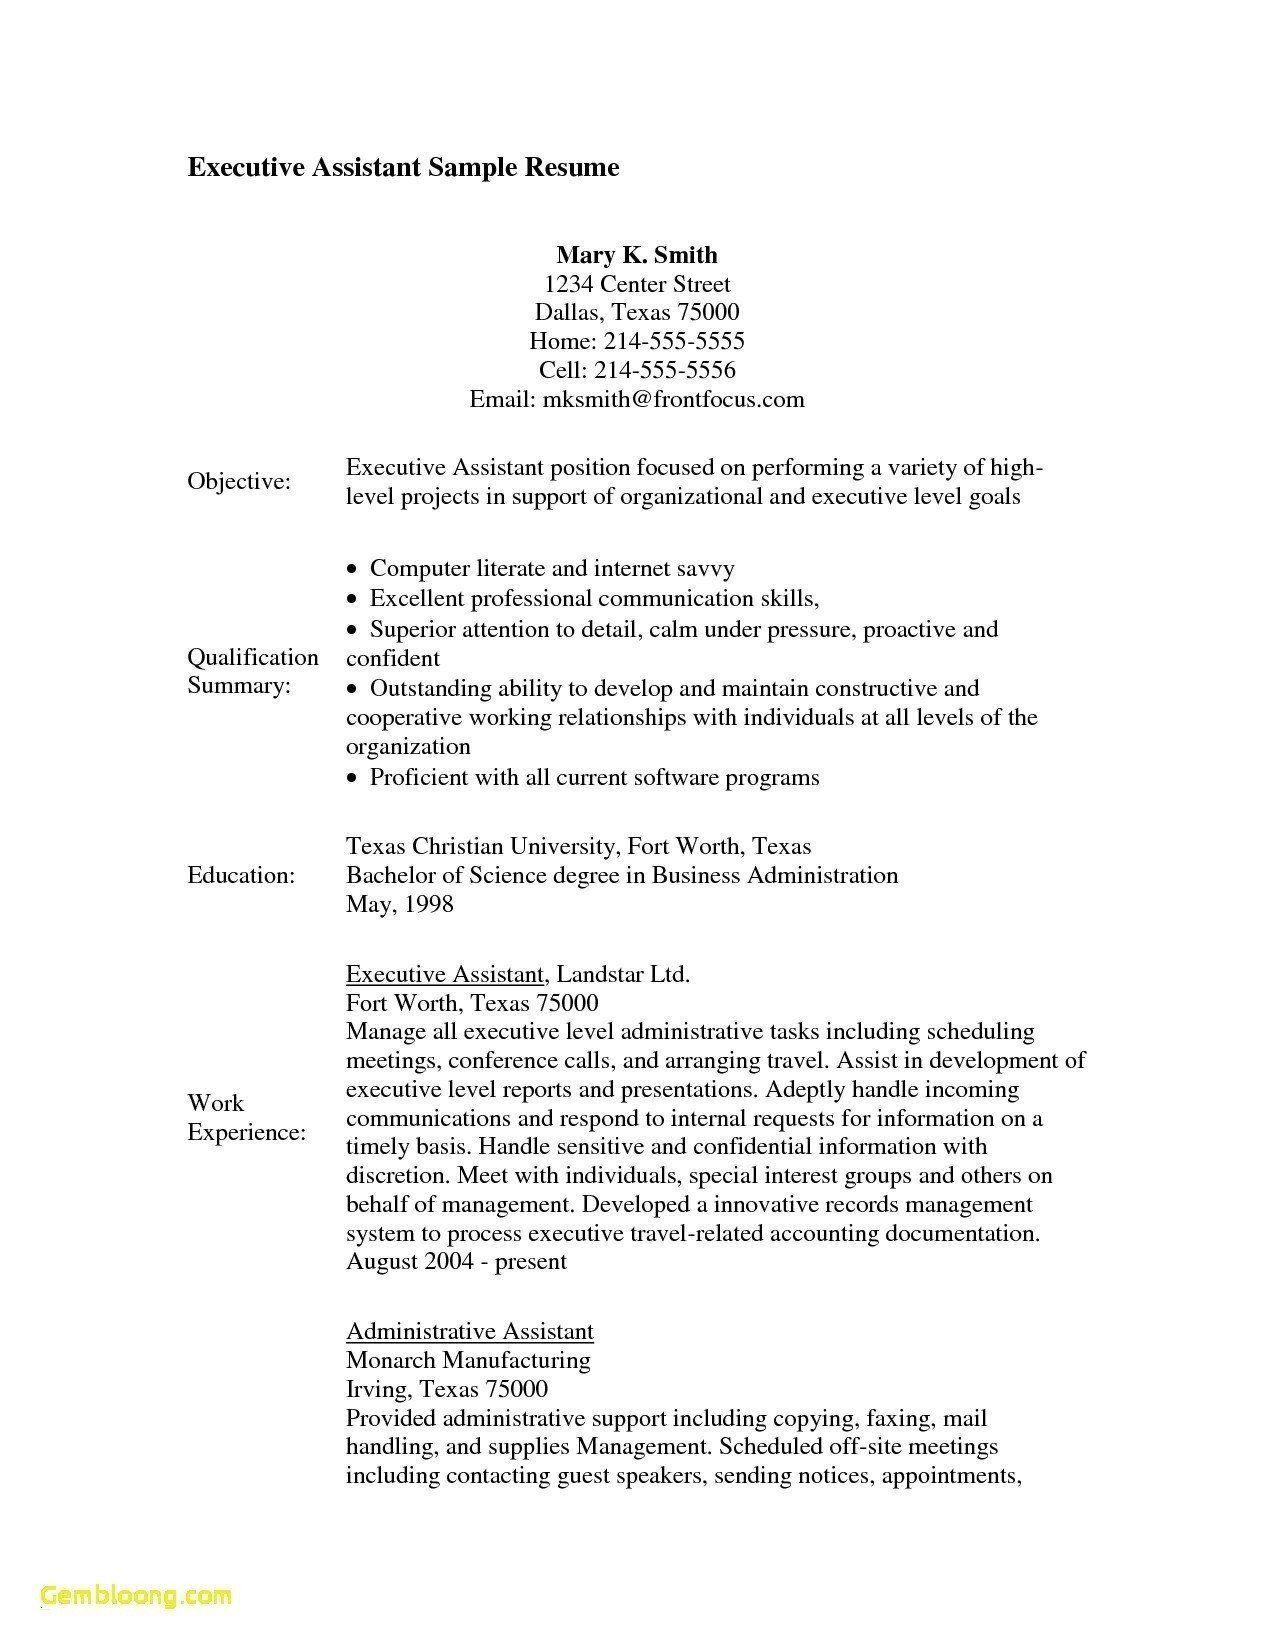 Sample Resume For Preschool Teacher Assistant Elegant Beautiful Christian Preschool Teacher Resume 50ger